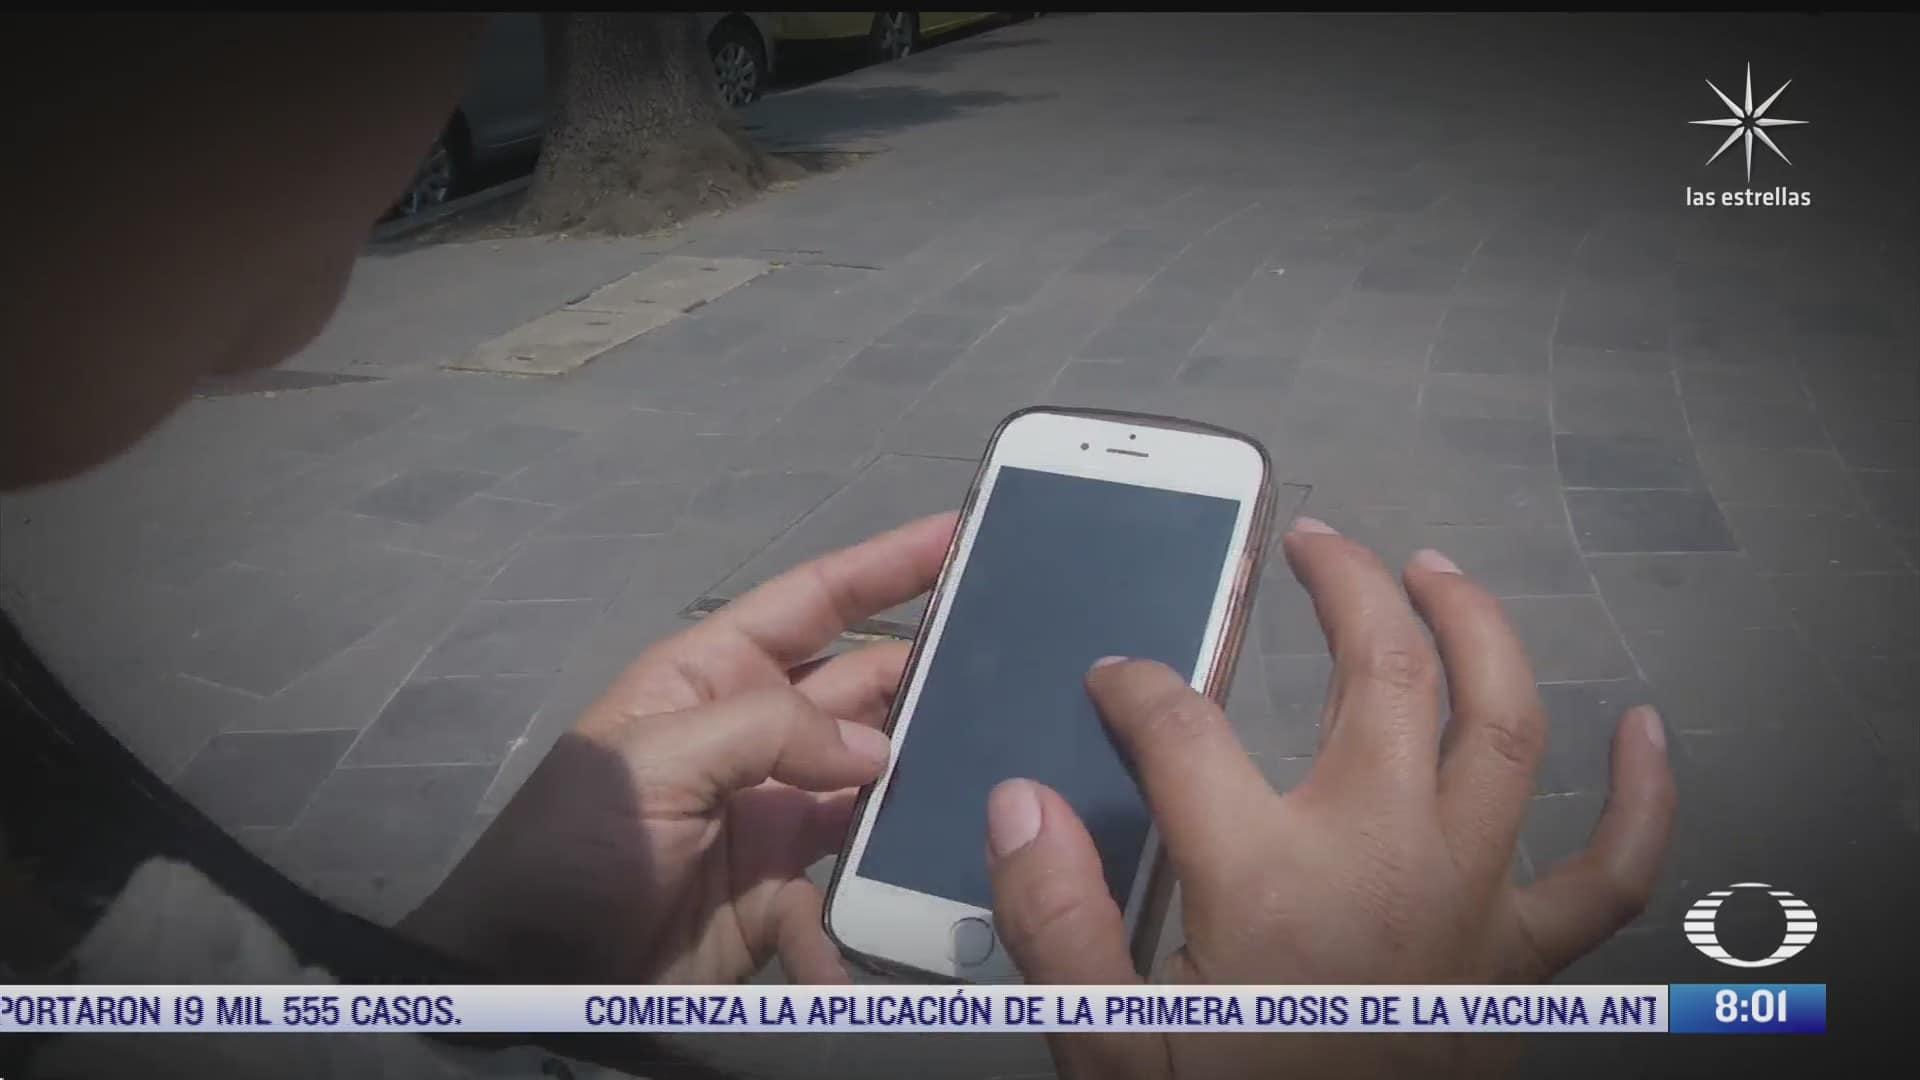 ciberacoso afecta a 9 4 millones de mujeres en mexico